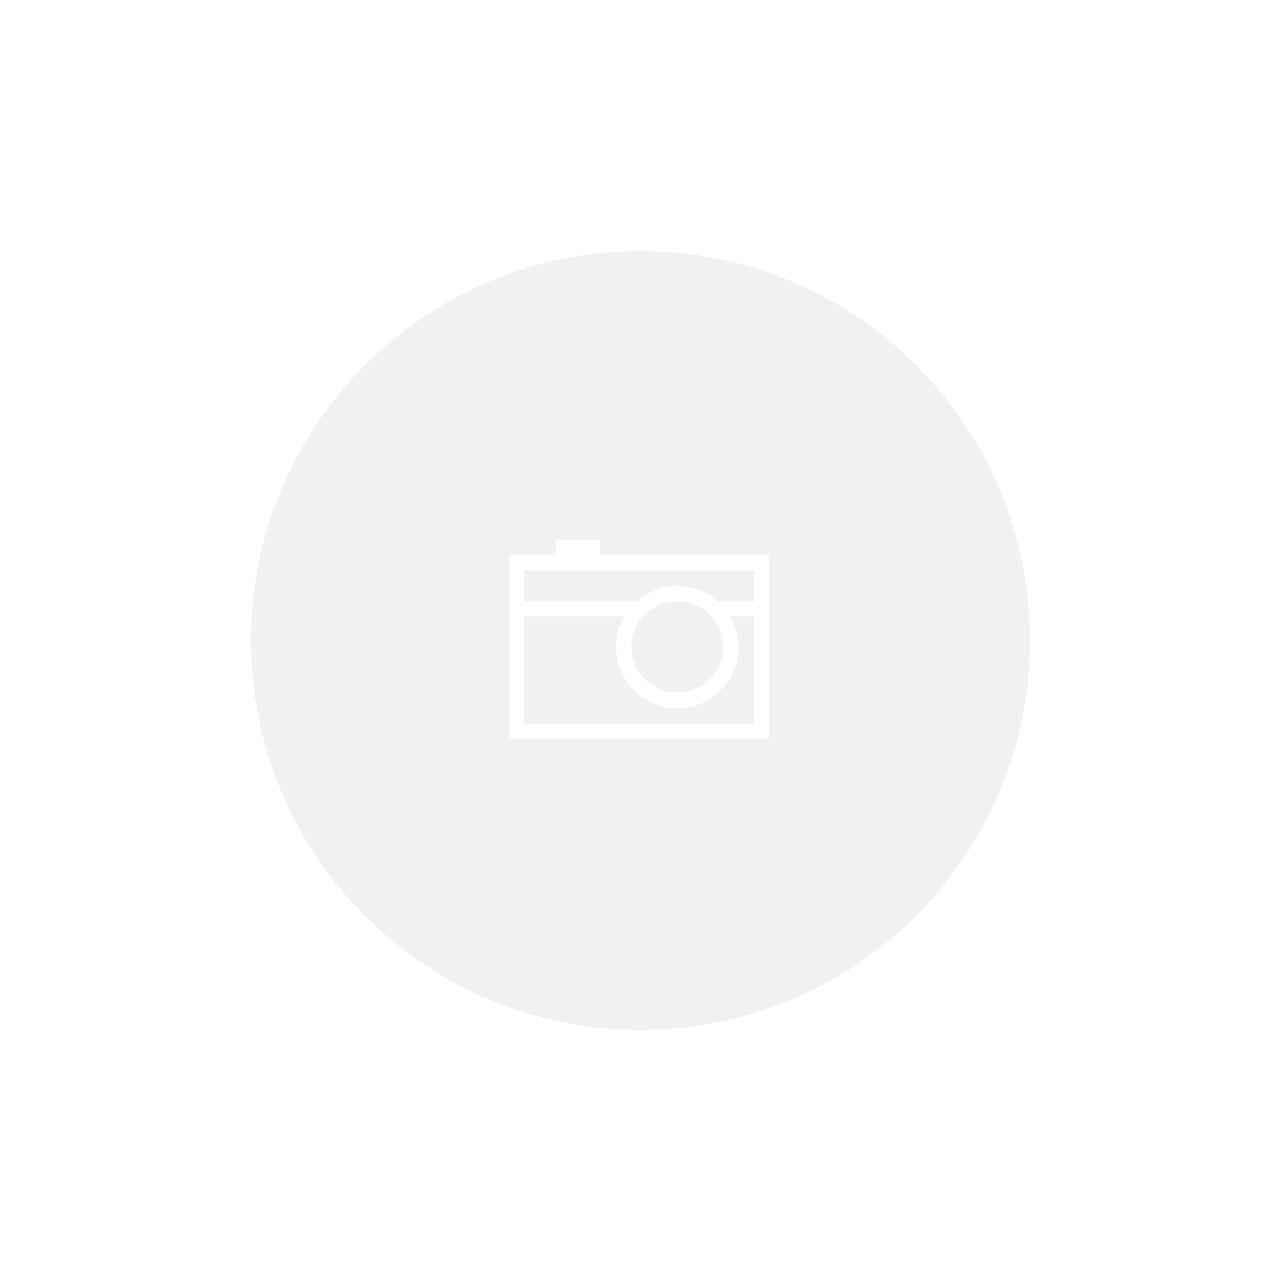 Fôrma com Fundo Móvel Antiaderente 26 cm Brasil Tramontina